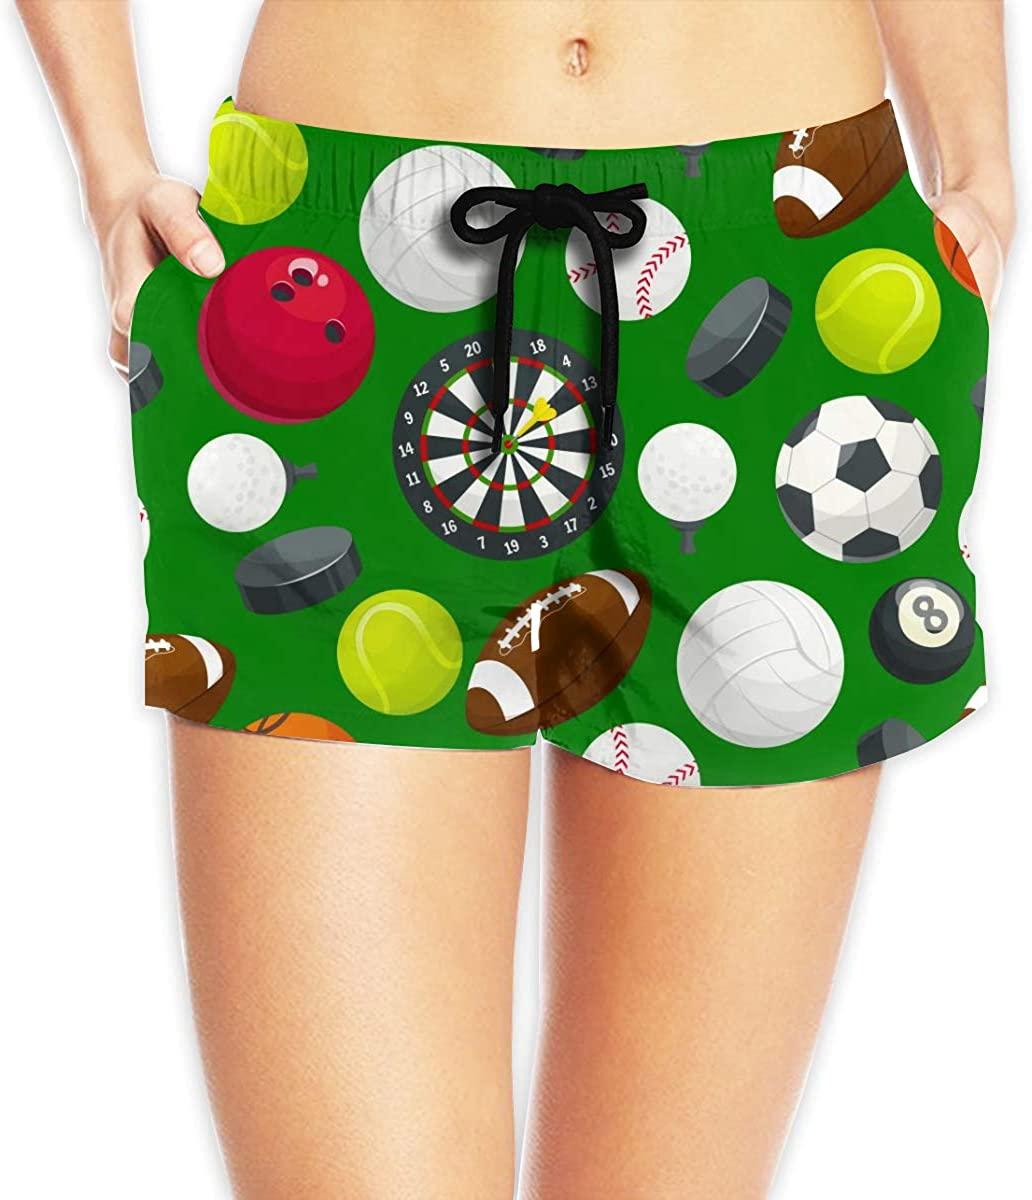 Sport Ball Pattern Women's Beach Shorts Board Shorts with Pocket Swimming Trunks